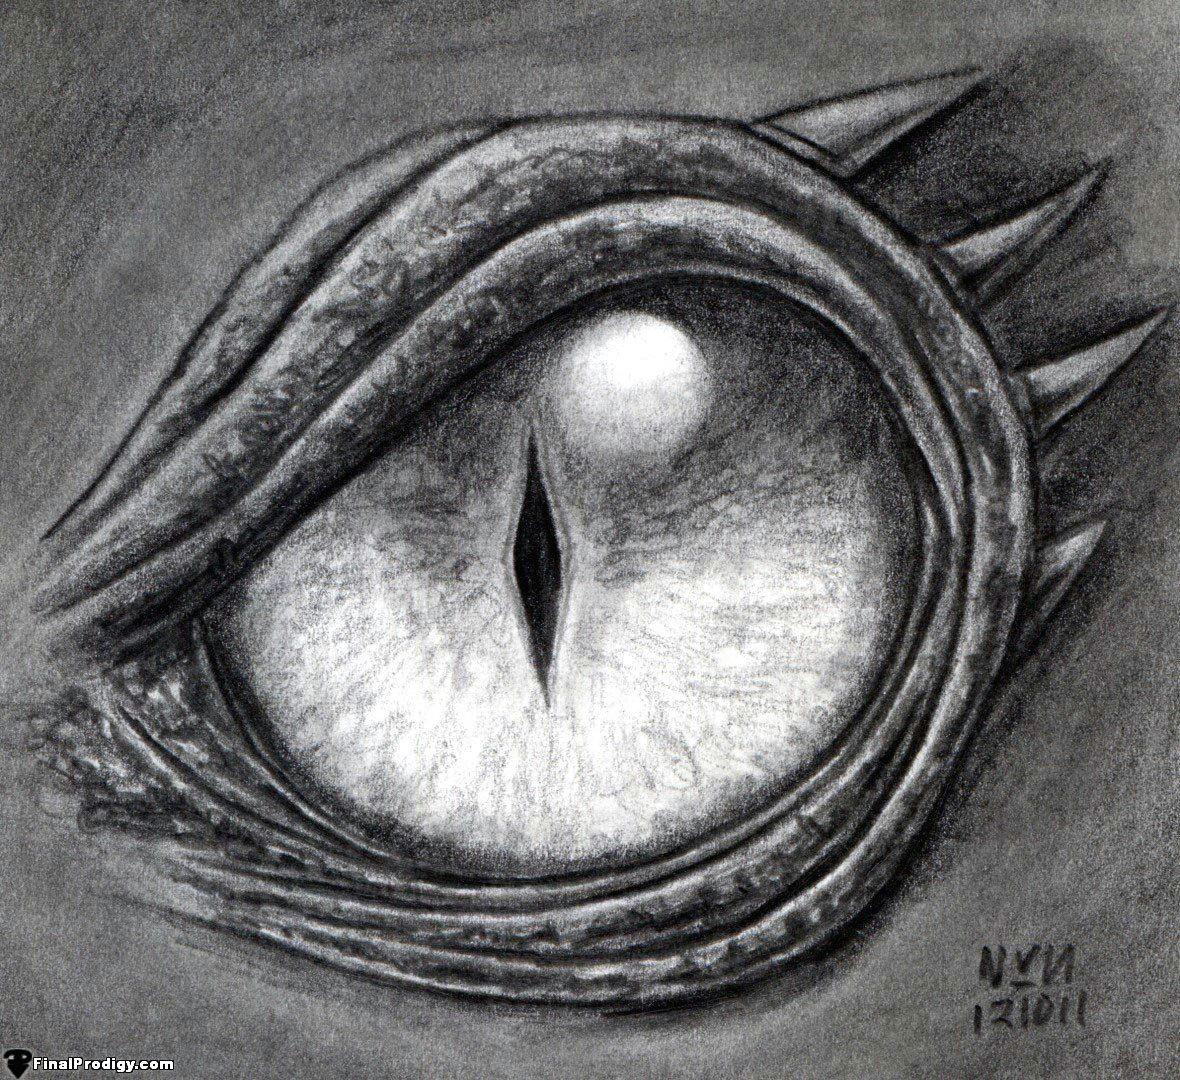 Dragon S Eye Drawing Tutorial How to Draw A Dragon Eye Step by Step Step 8 Define the Dark